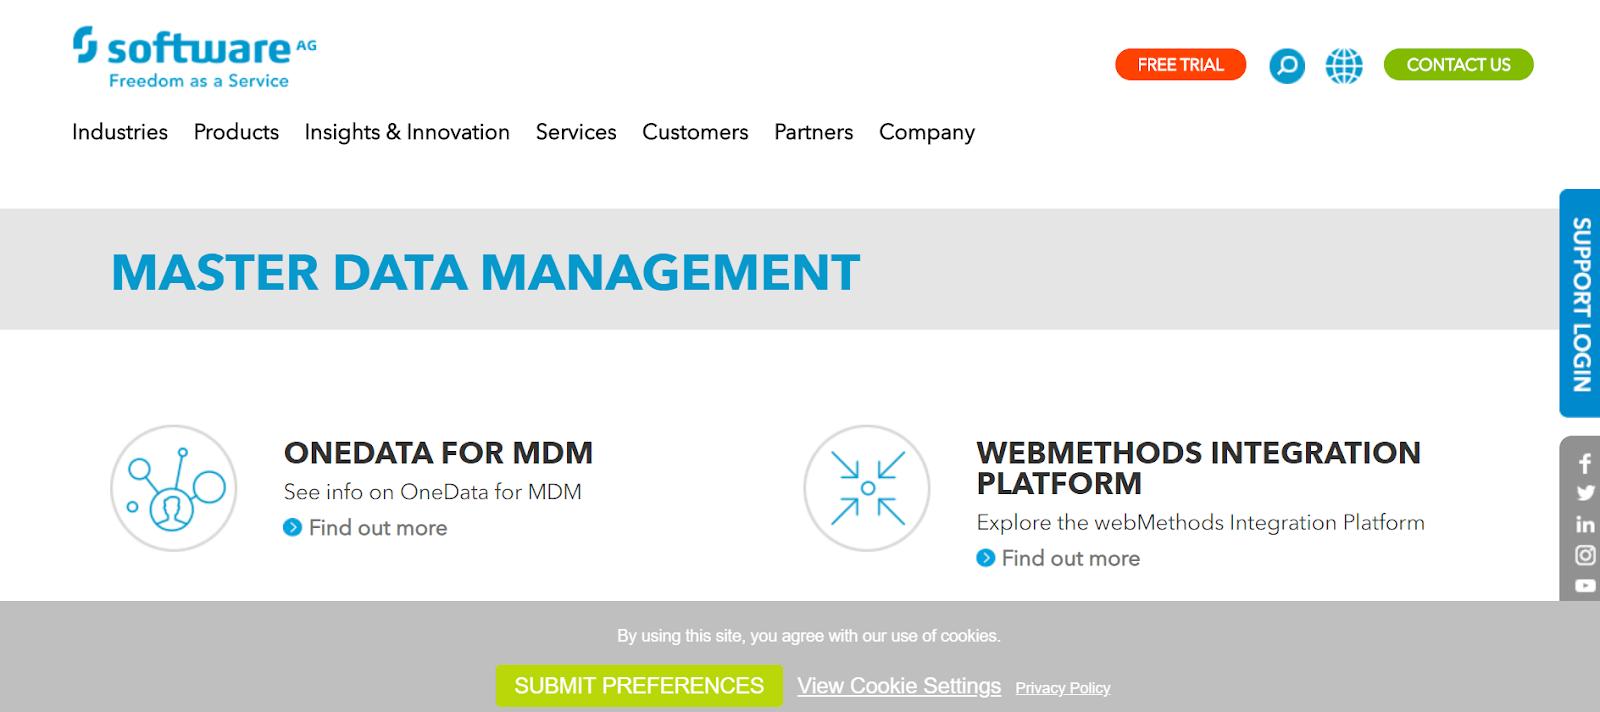 Software AG Data Management Tool